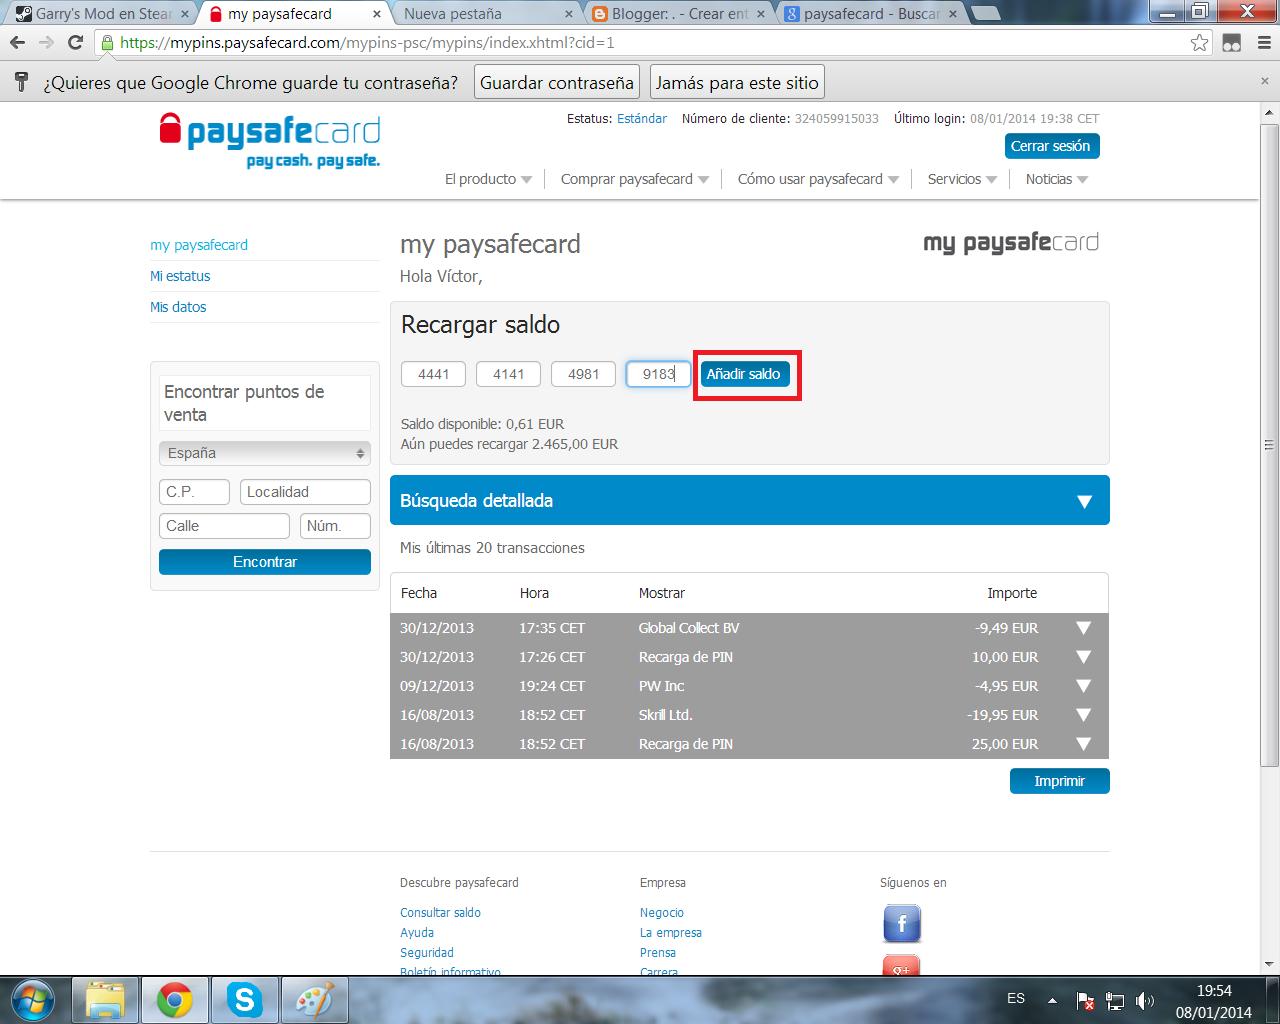 www.paysafecard.com login